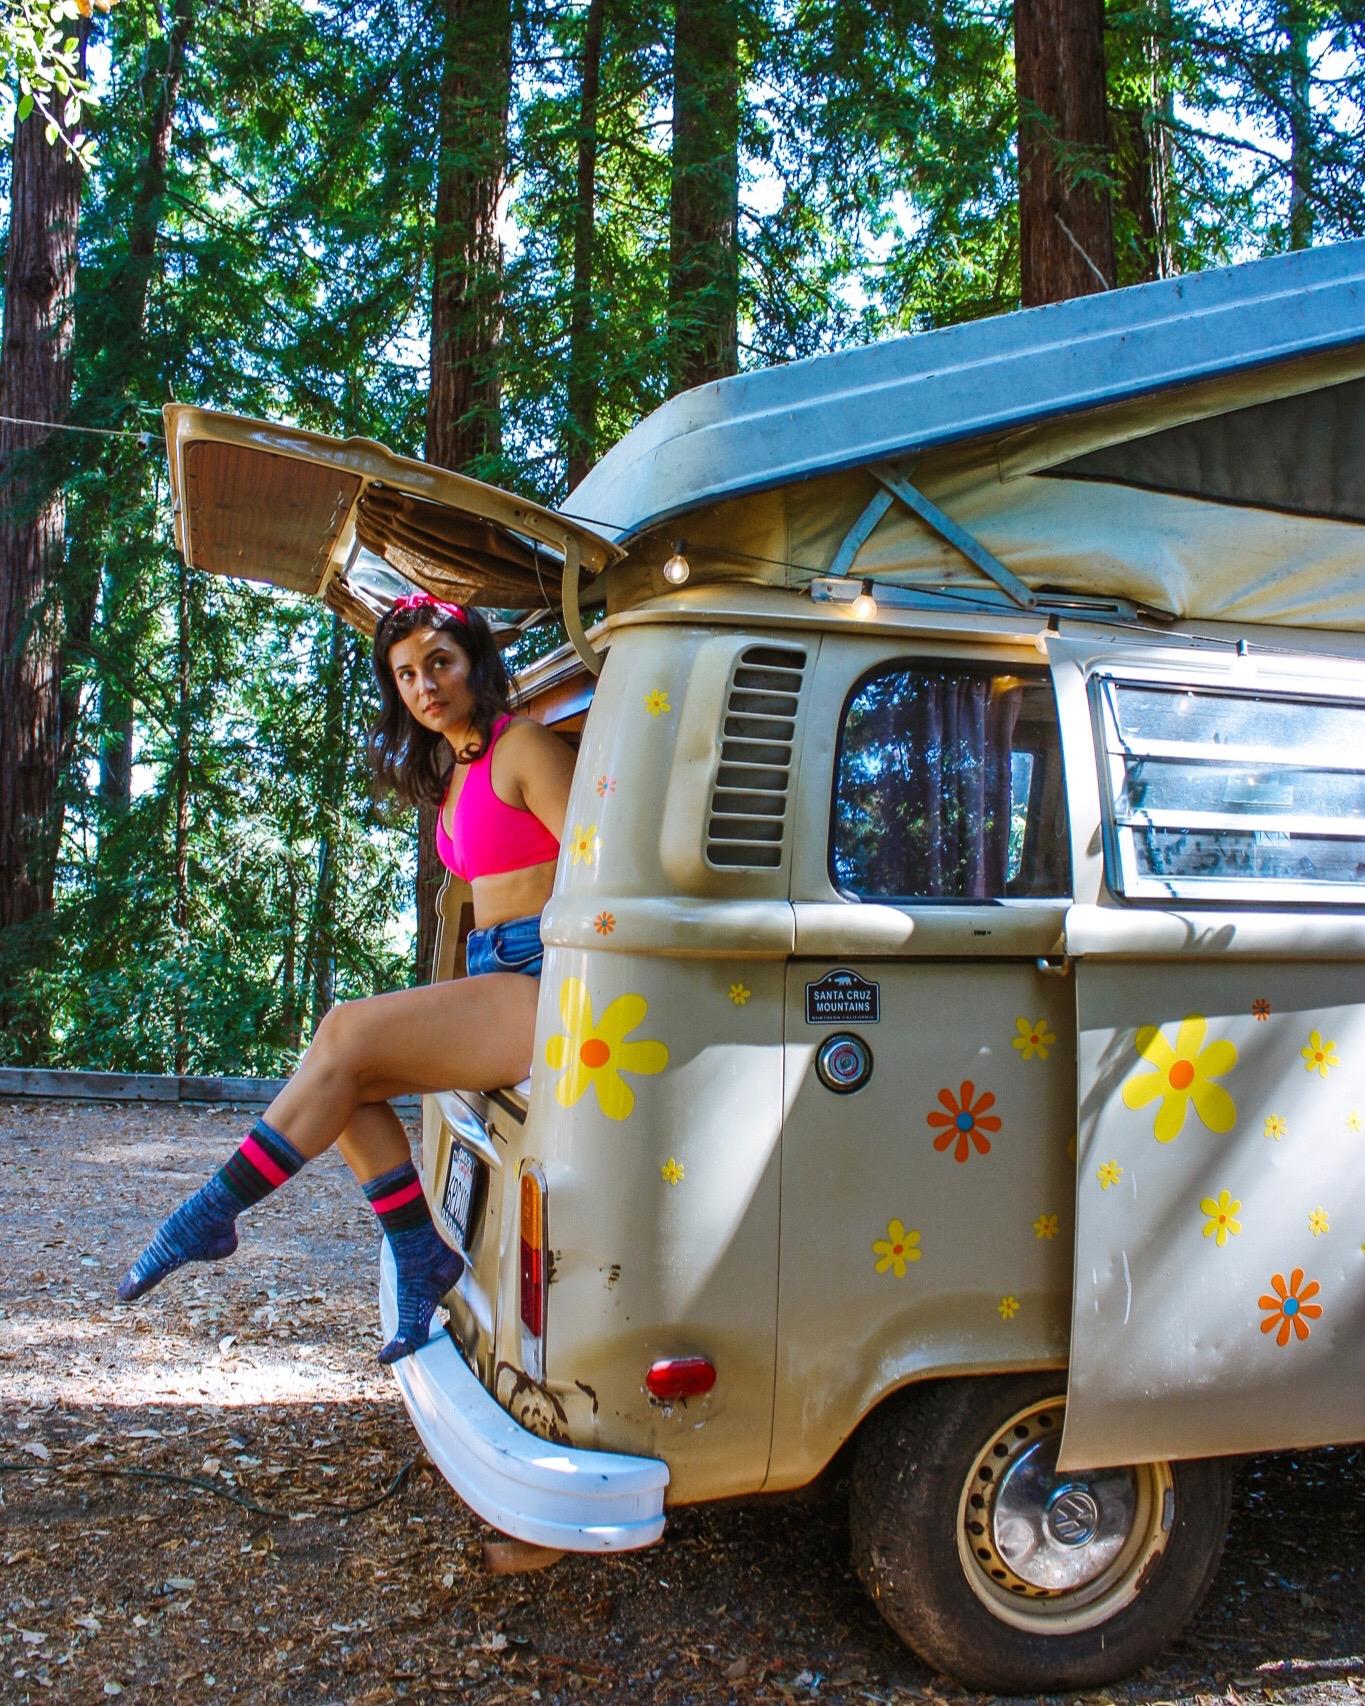 bombas sponsored post woman in VW camper van wearing socks